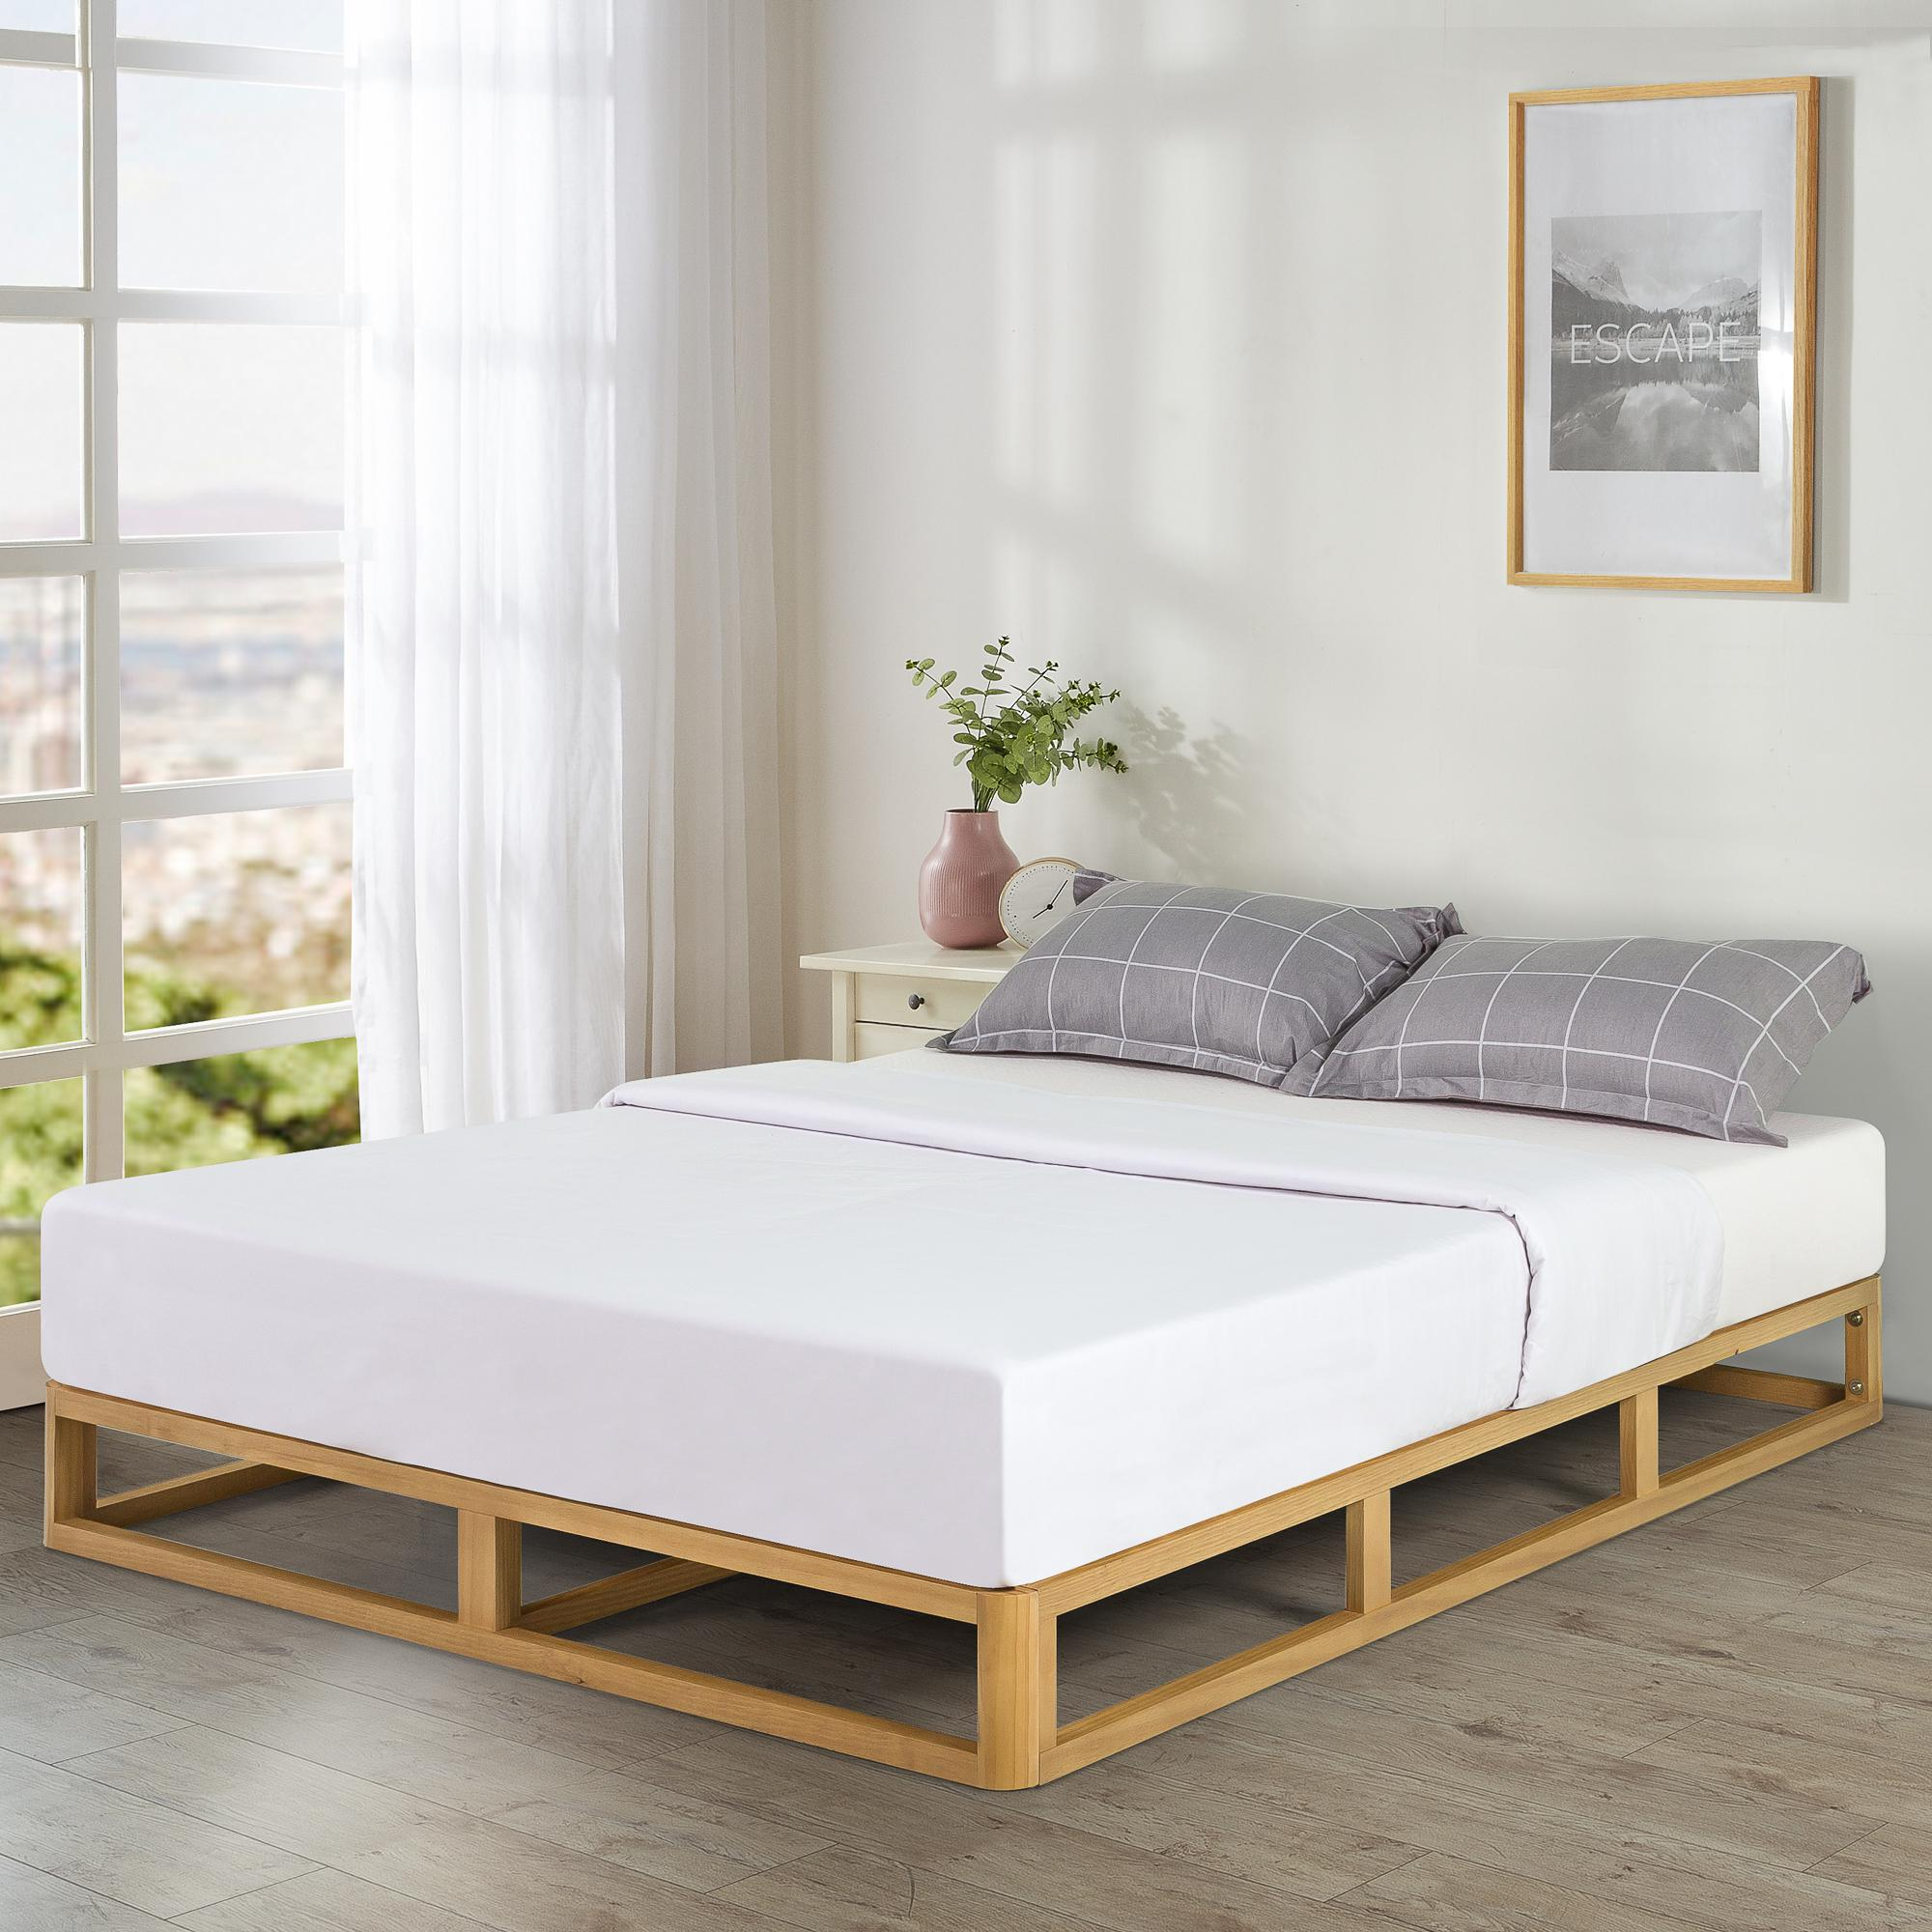 Zinus Industrial Pine Wood Bed Frame Low Bed Base Mattress Foundation Natural 20cm Double Queen Size Matt Blatt